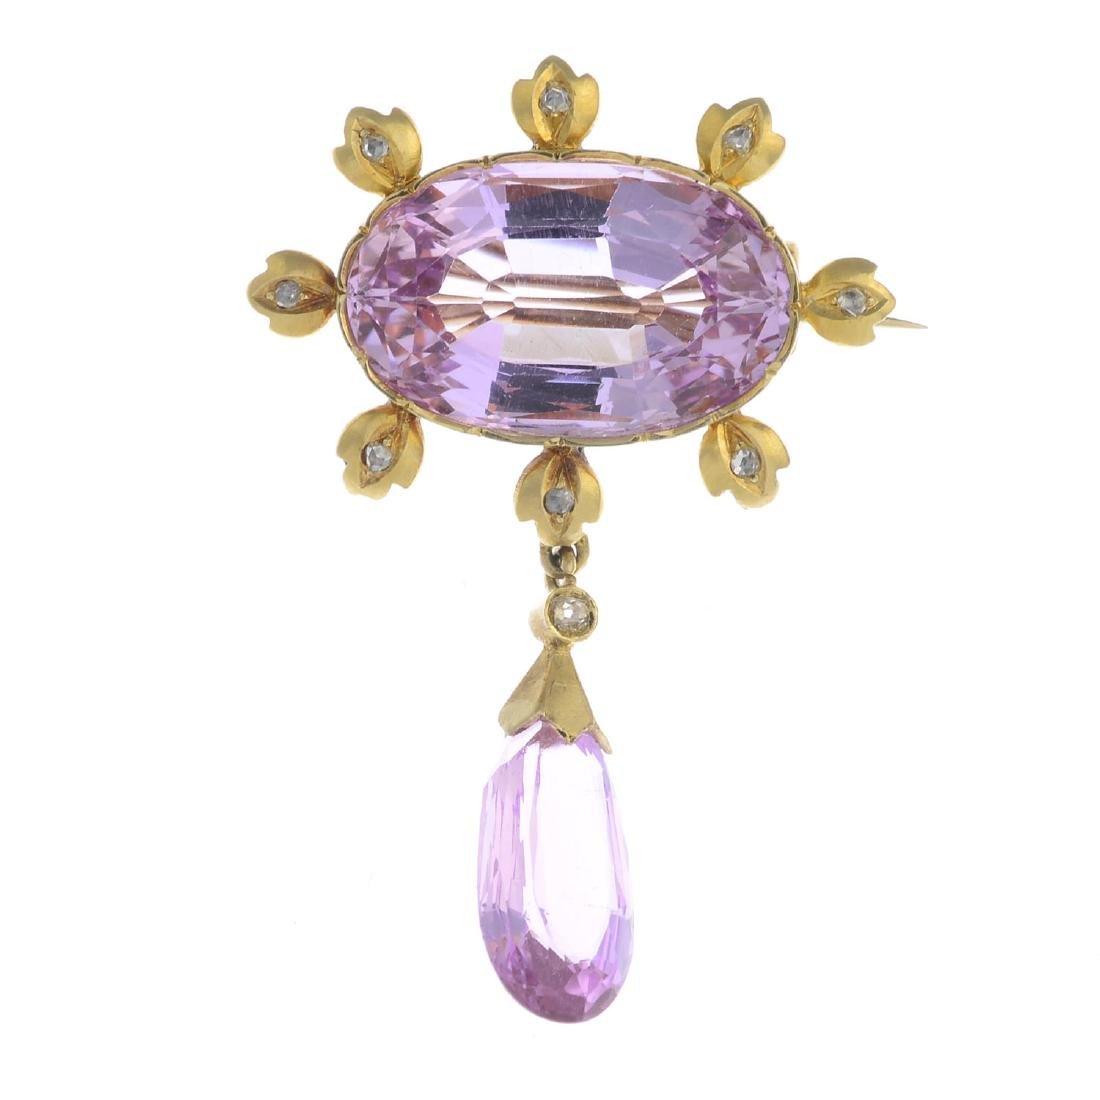 A topaz and diamond brooch. The pear-shape pink topaz